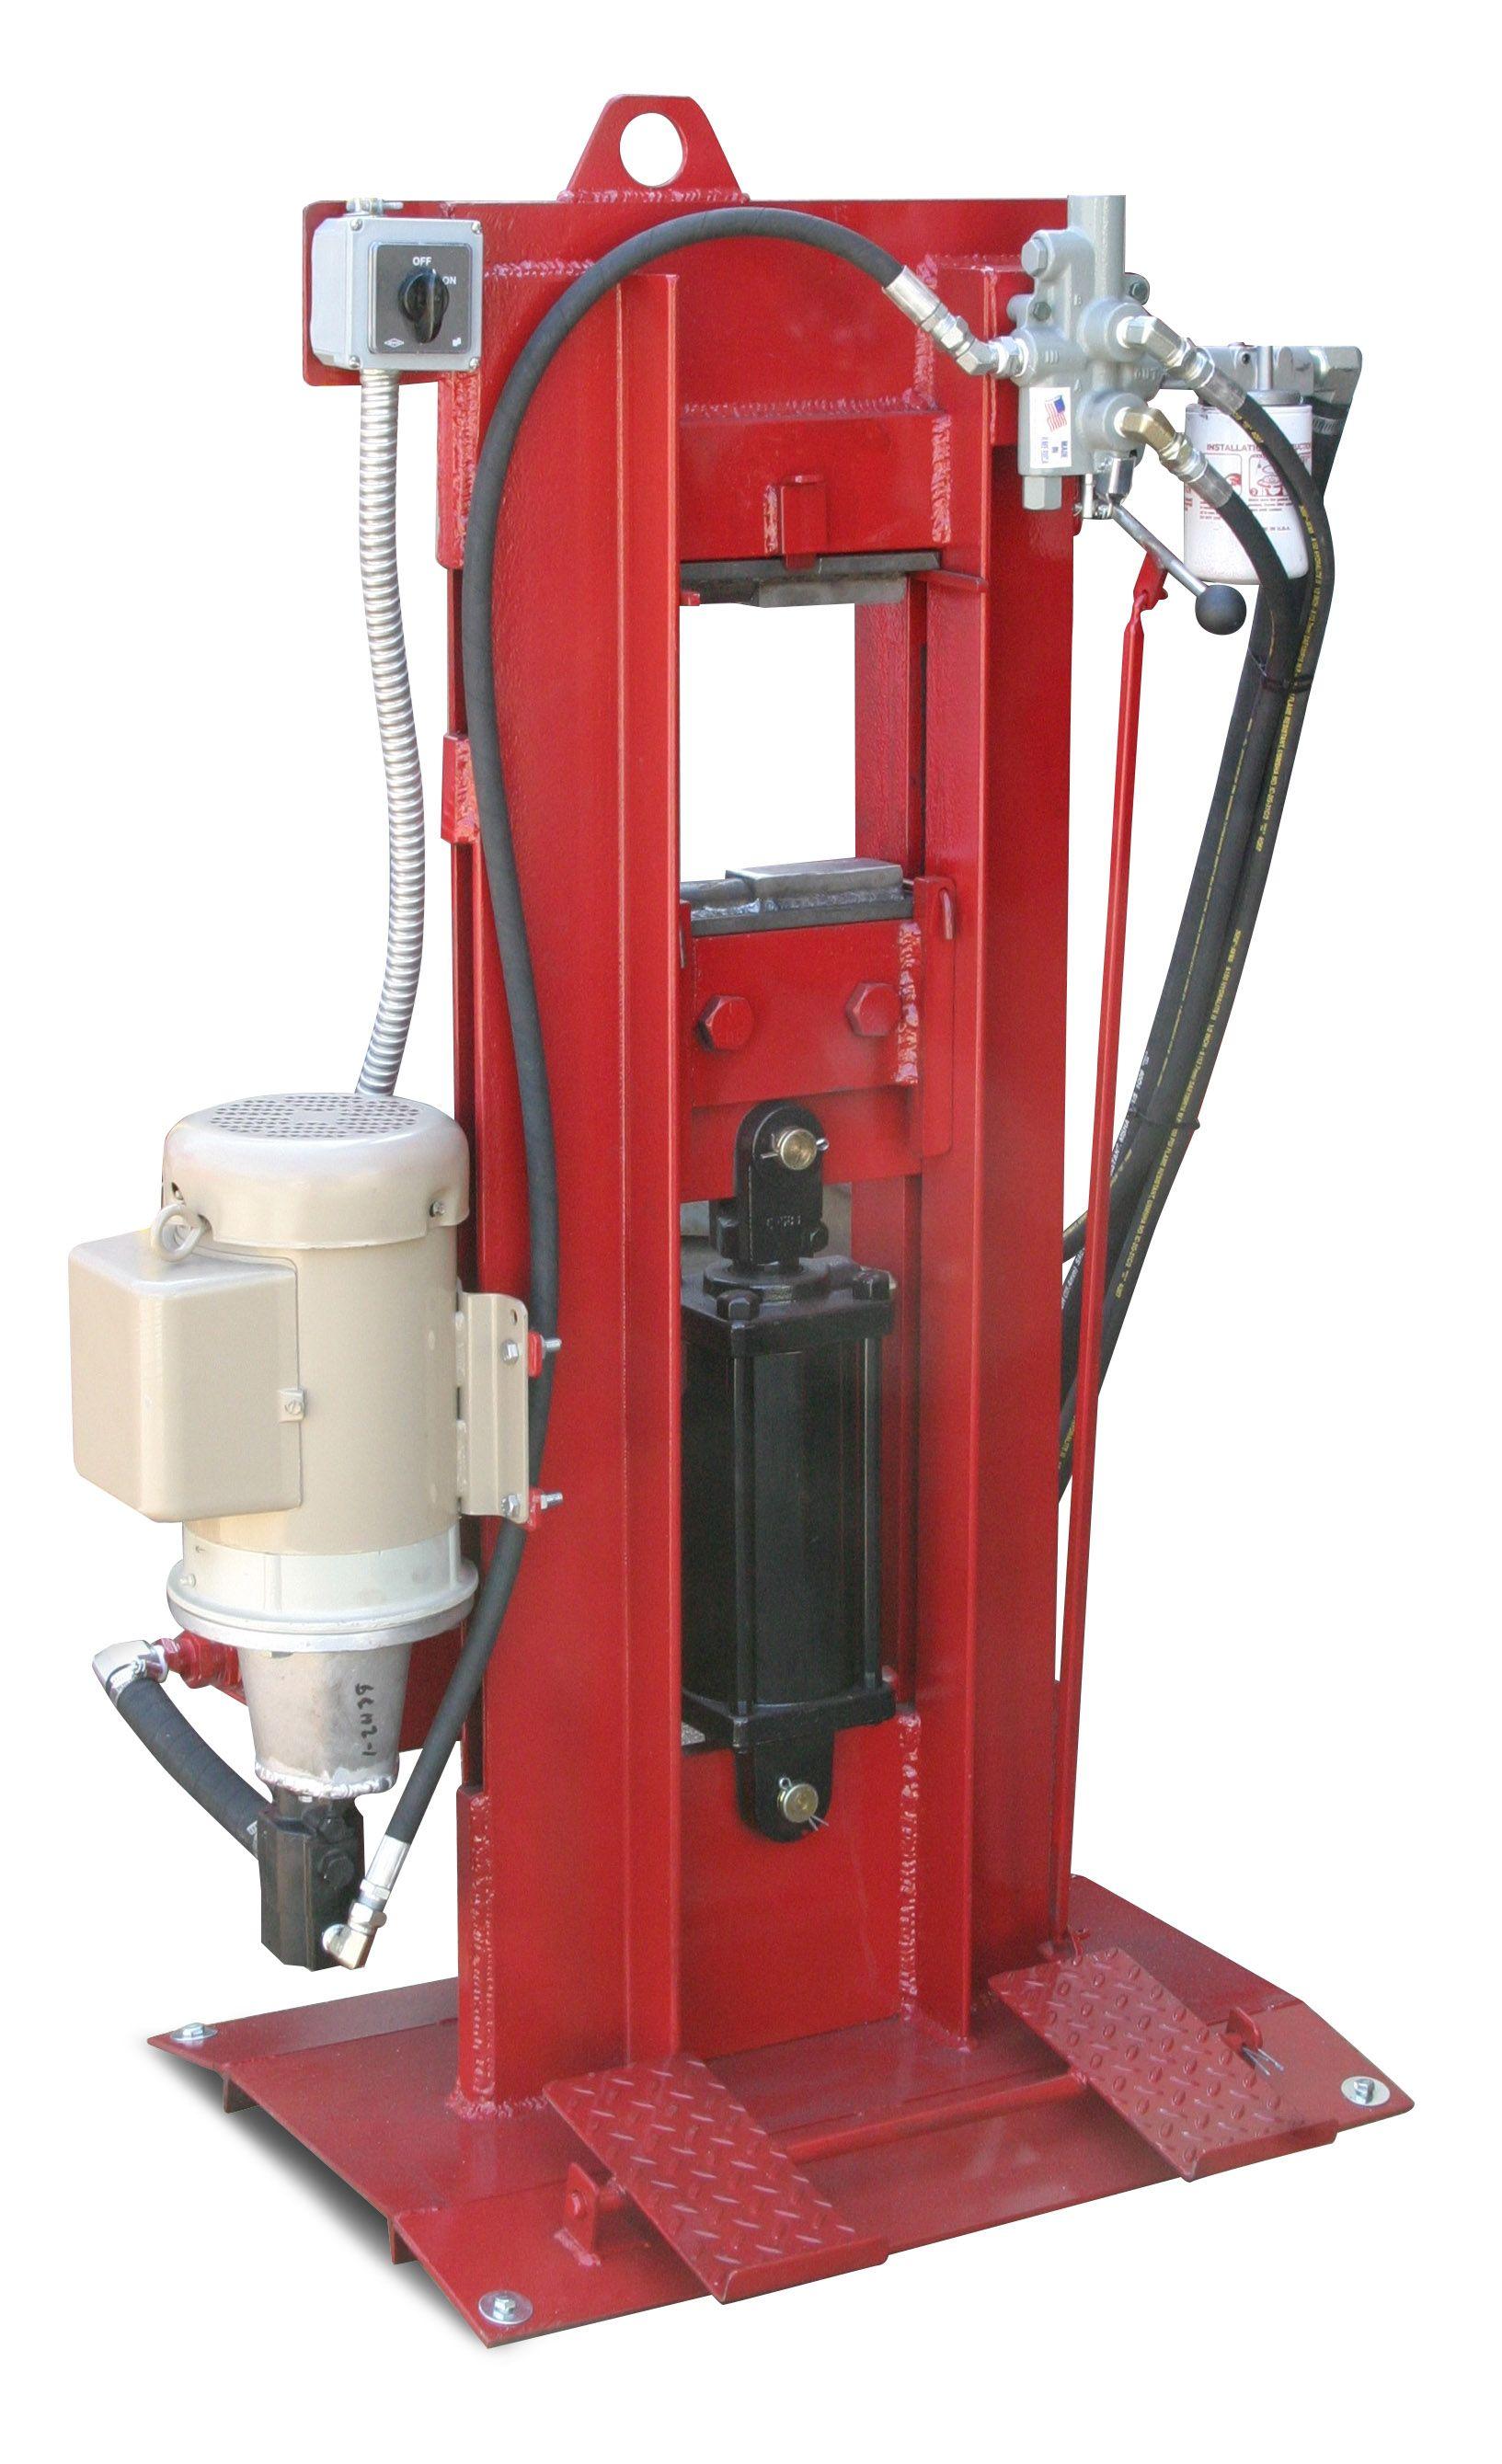 Hydraulic Forging Press Click Image To Close Forging Tools Metal Working Tools Blacksmithing